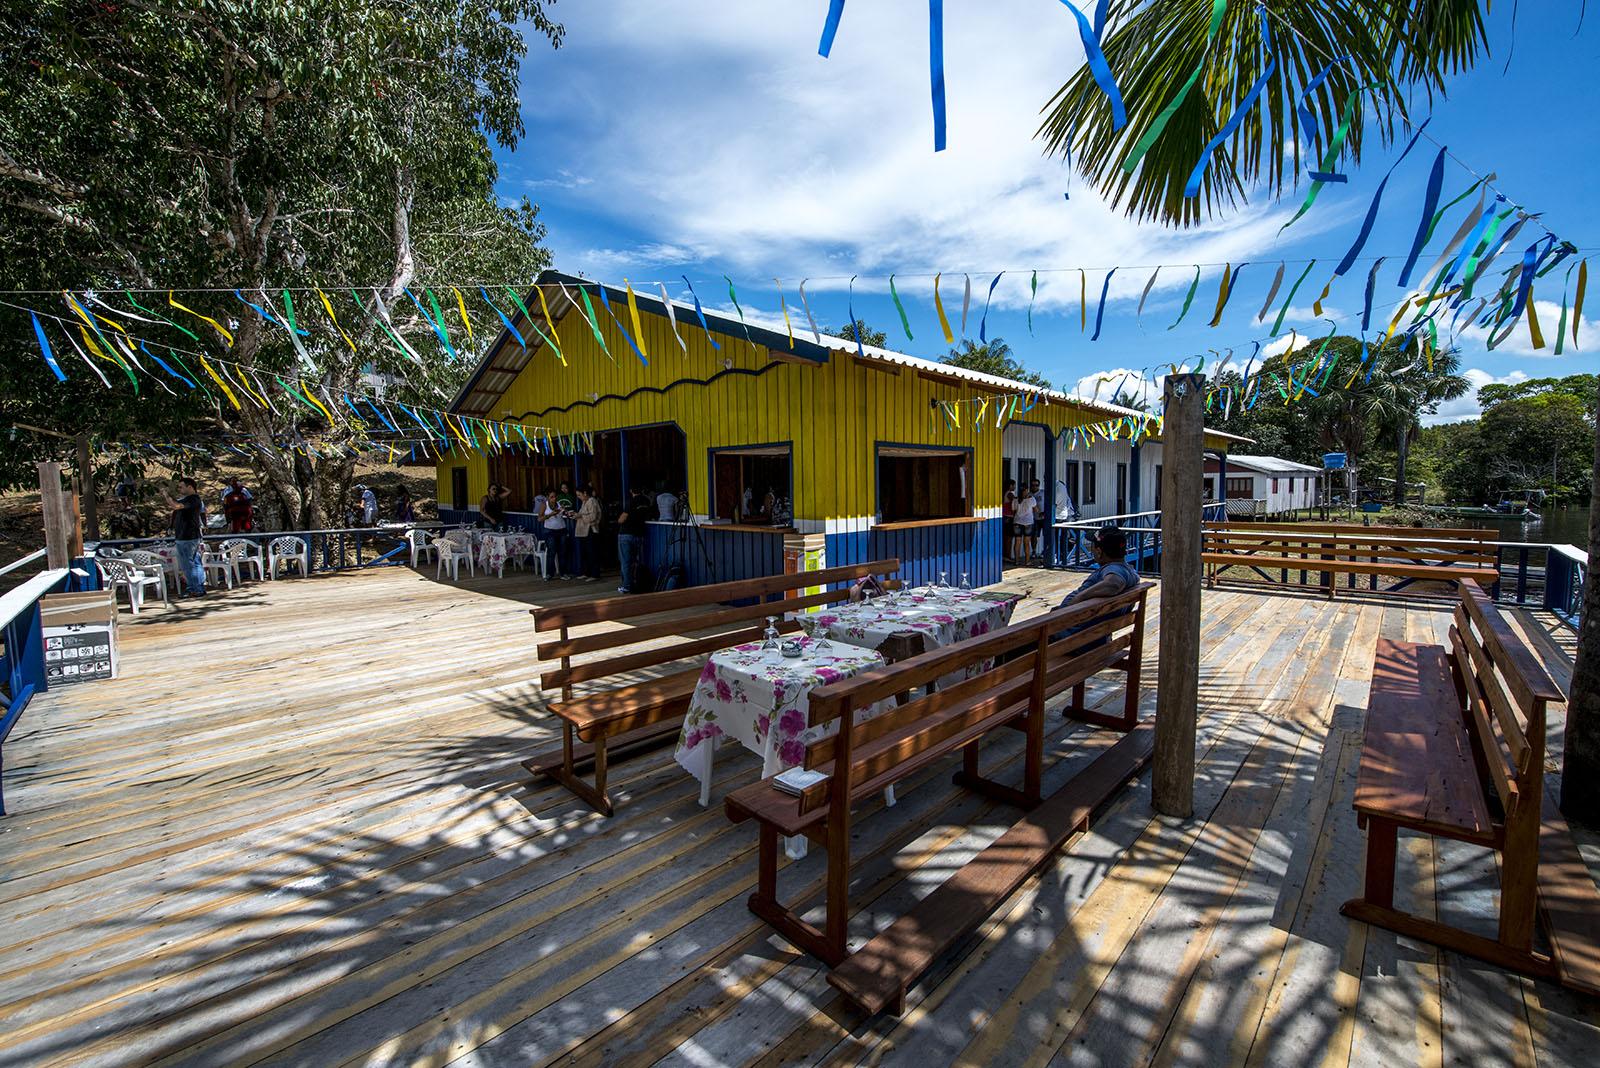 Curso de intercâmbio forma multiplicadores de turismo sustentável na Amazônia